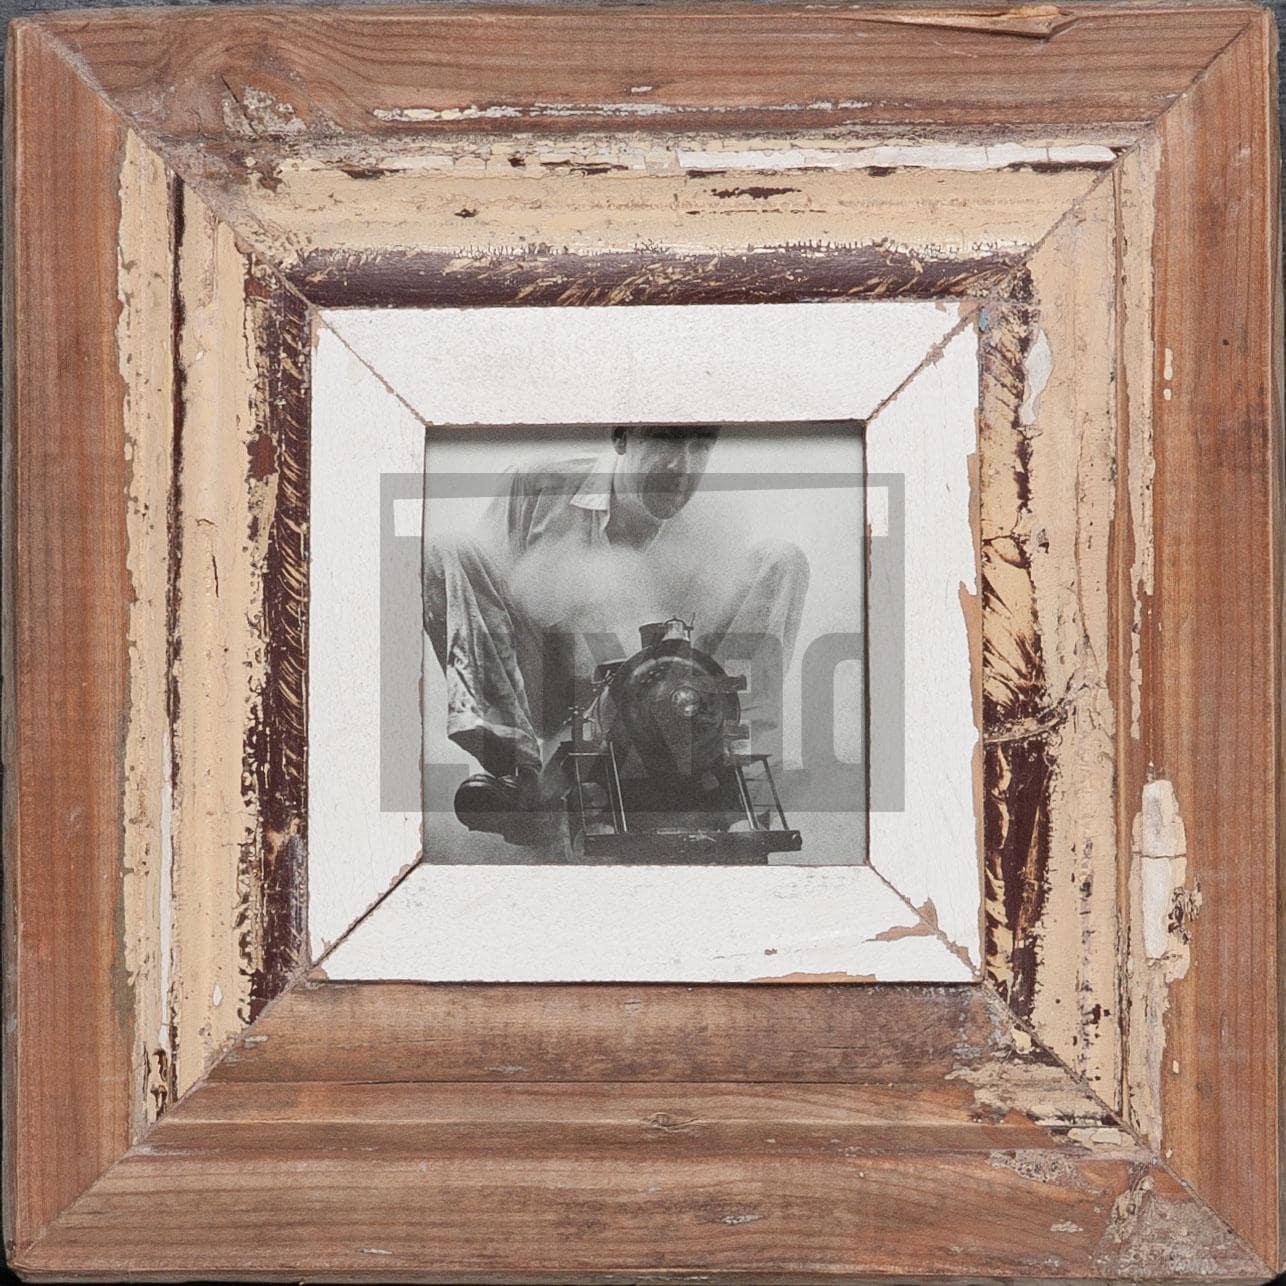 Quadratischer Altholz-Bilderrahmen für ca. 10,5 x 10,5 cm